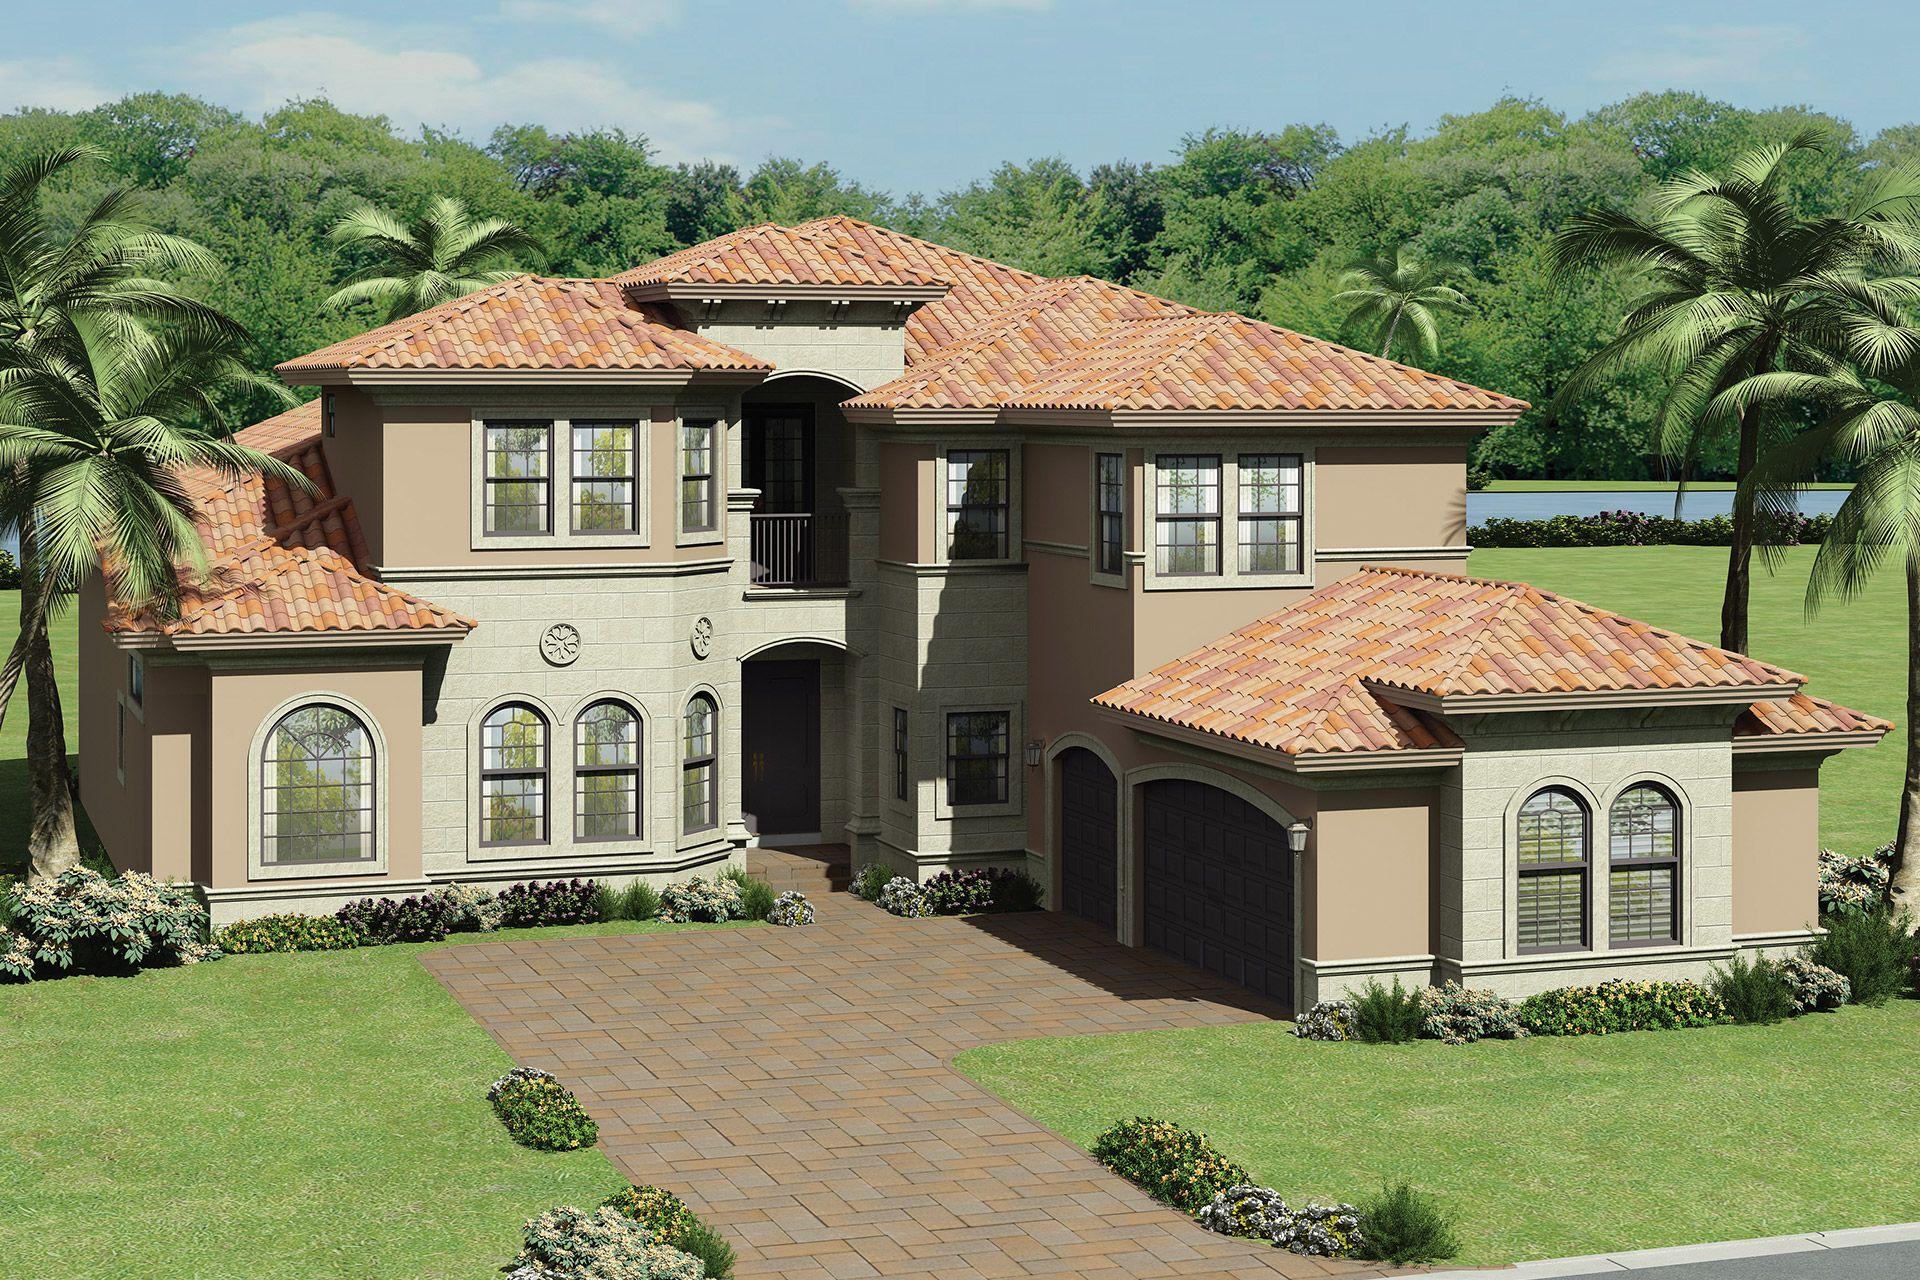 Seven Bridges Colonnade Grande Mediterranean Style Rendering Florida Real Estate African House Mediterranean Homes